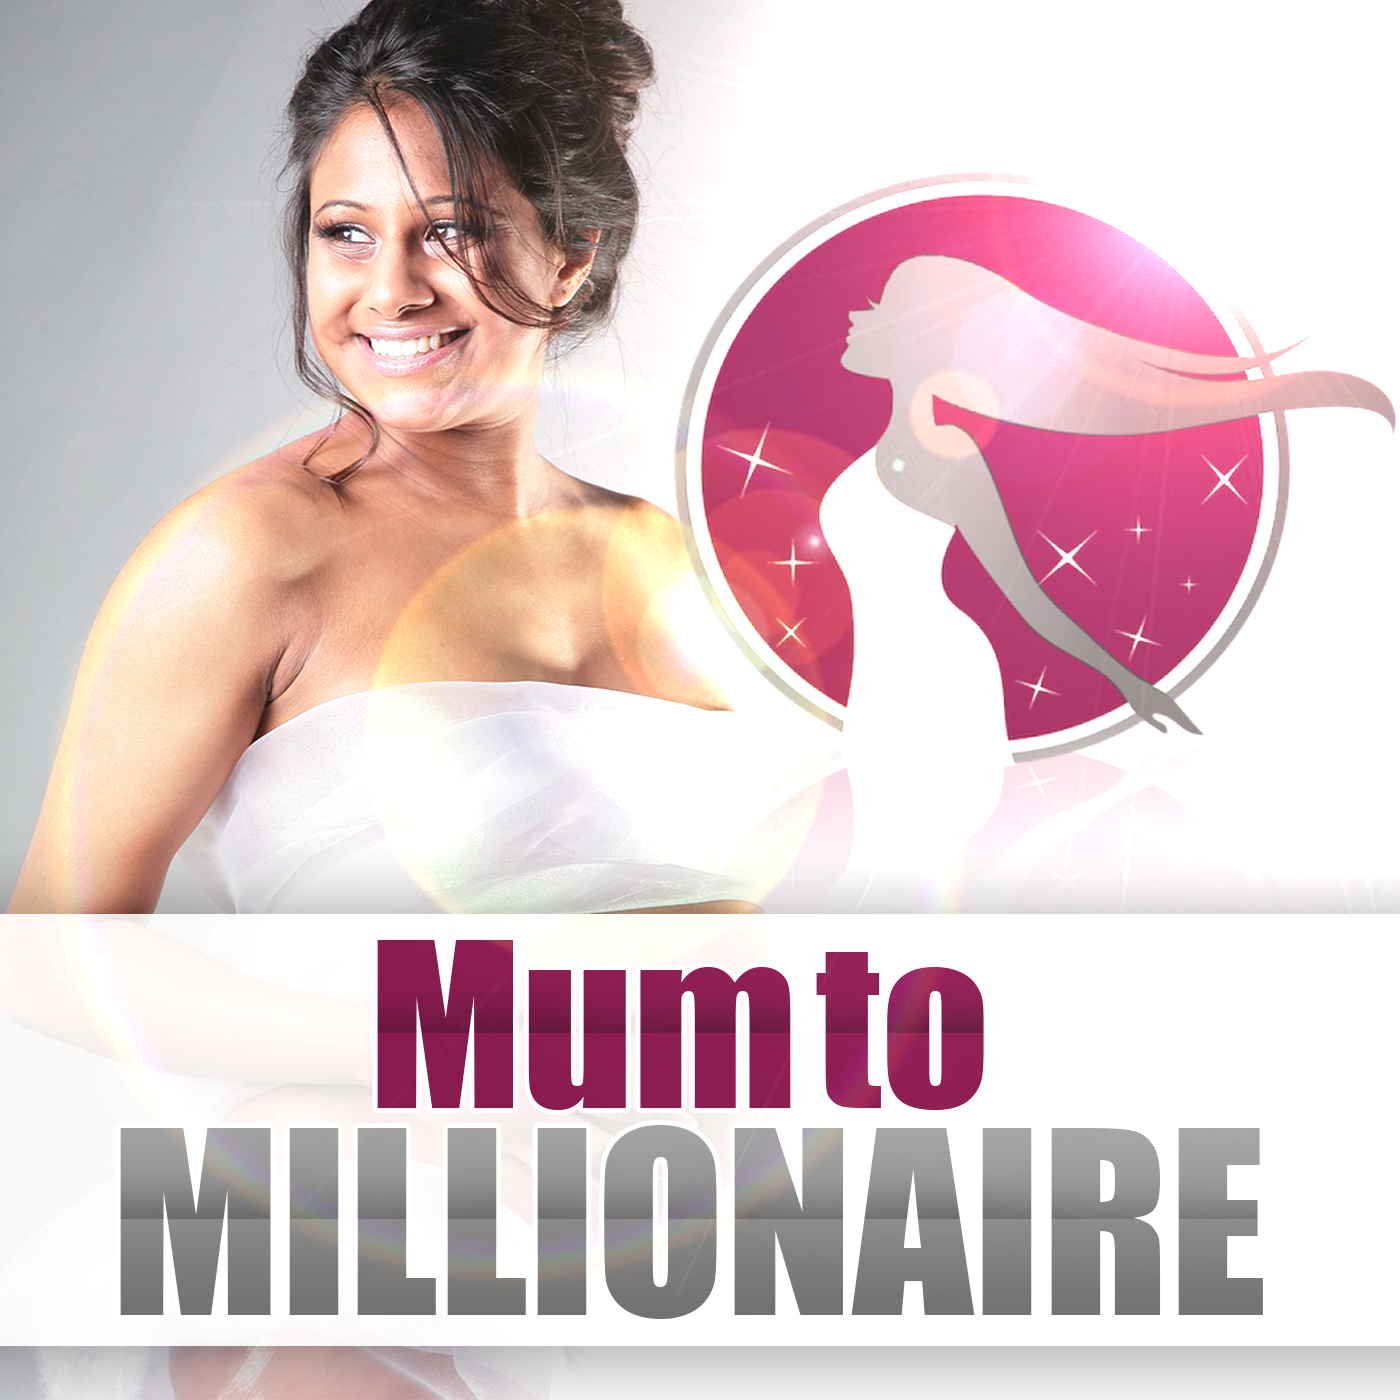 Mum to Millionaire Podcast